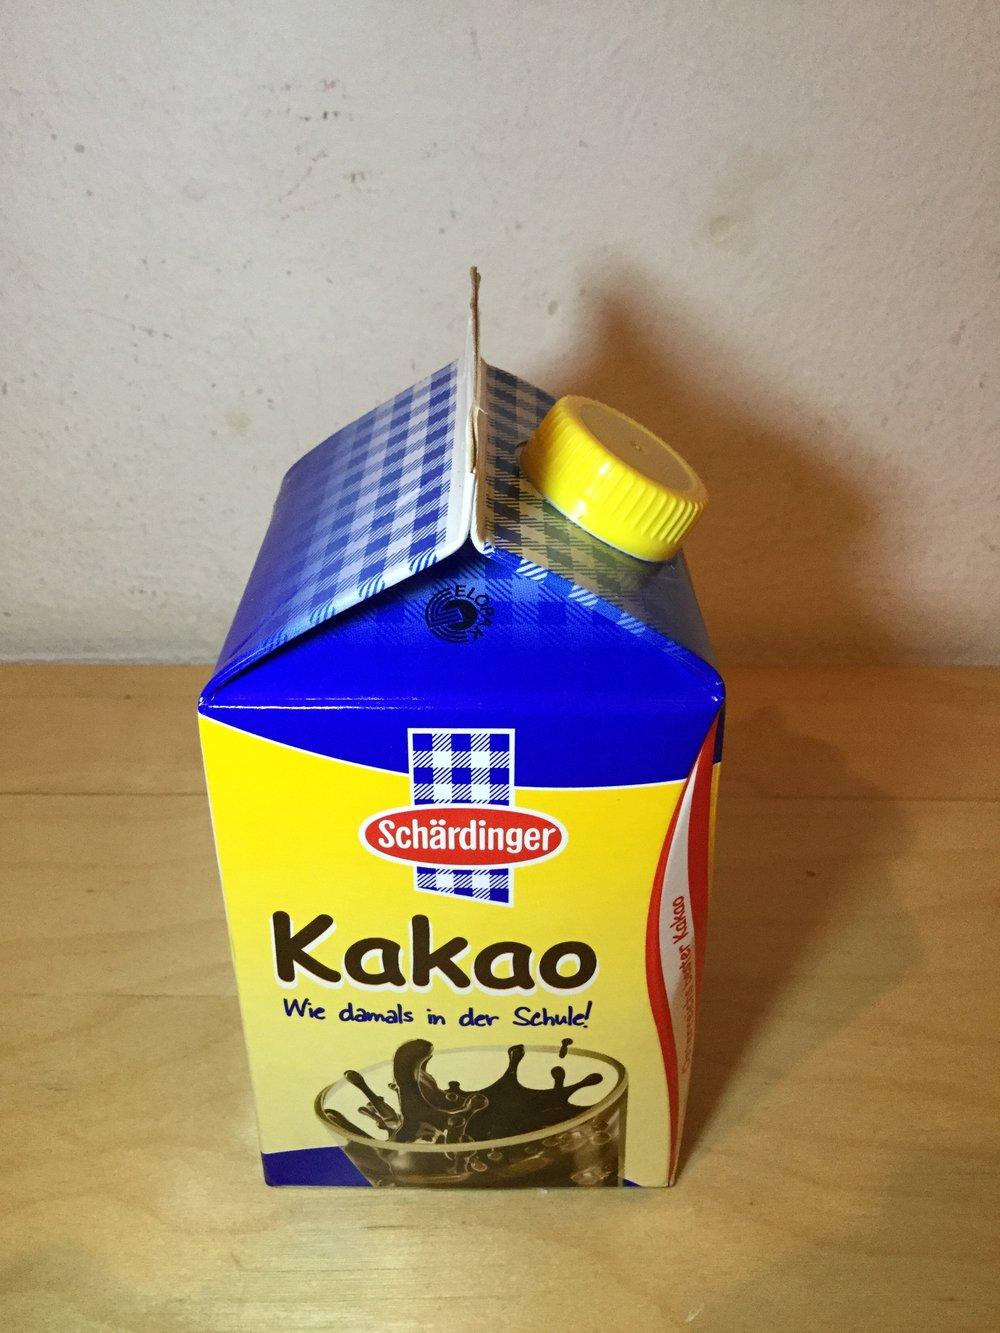 Schärdinger Kakao Side 2